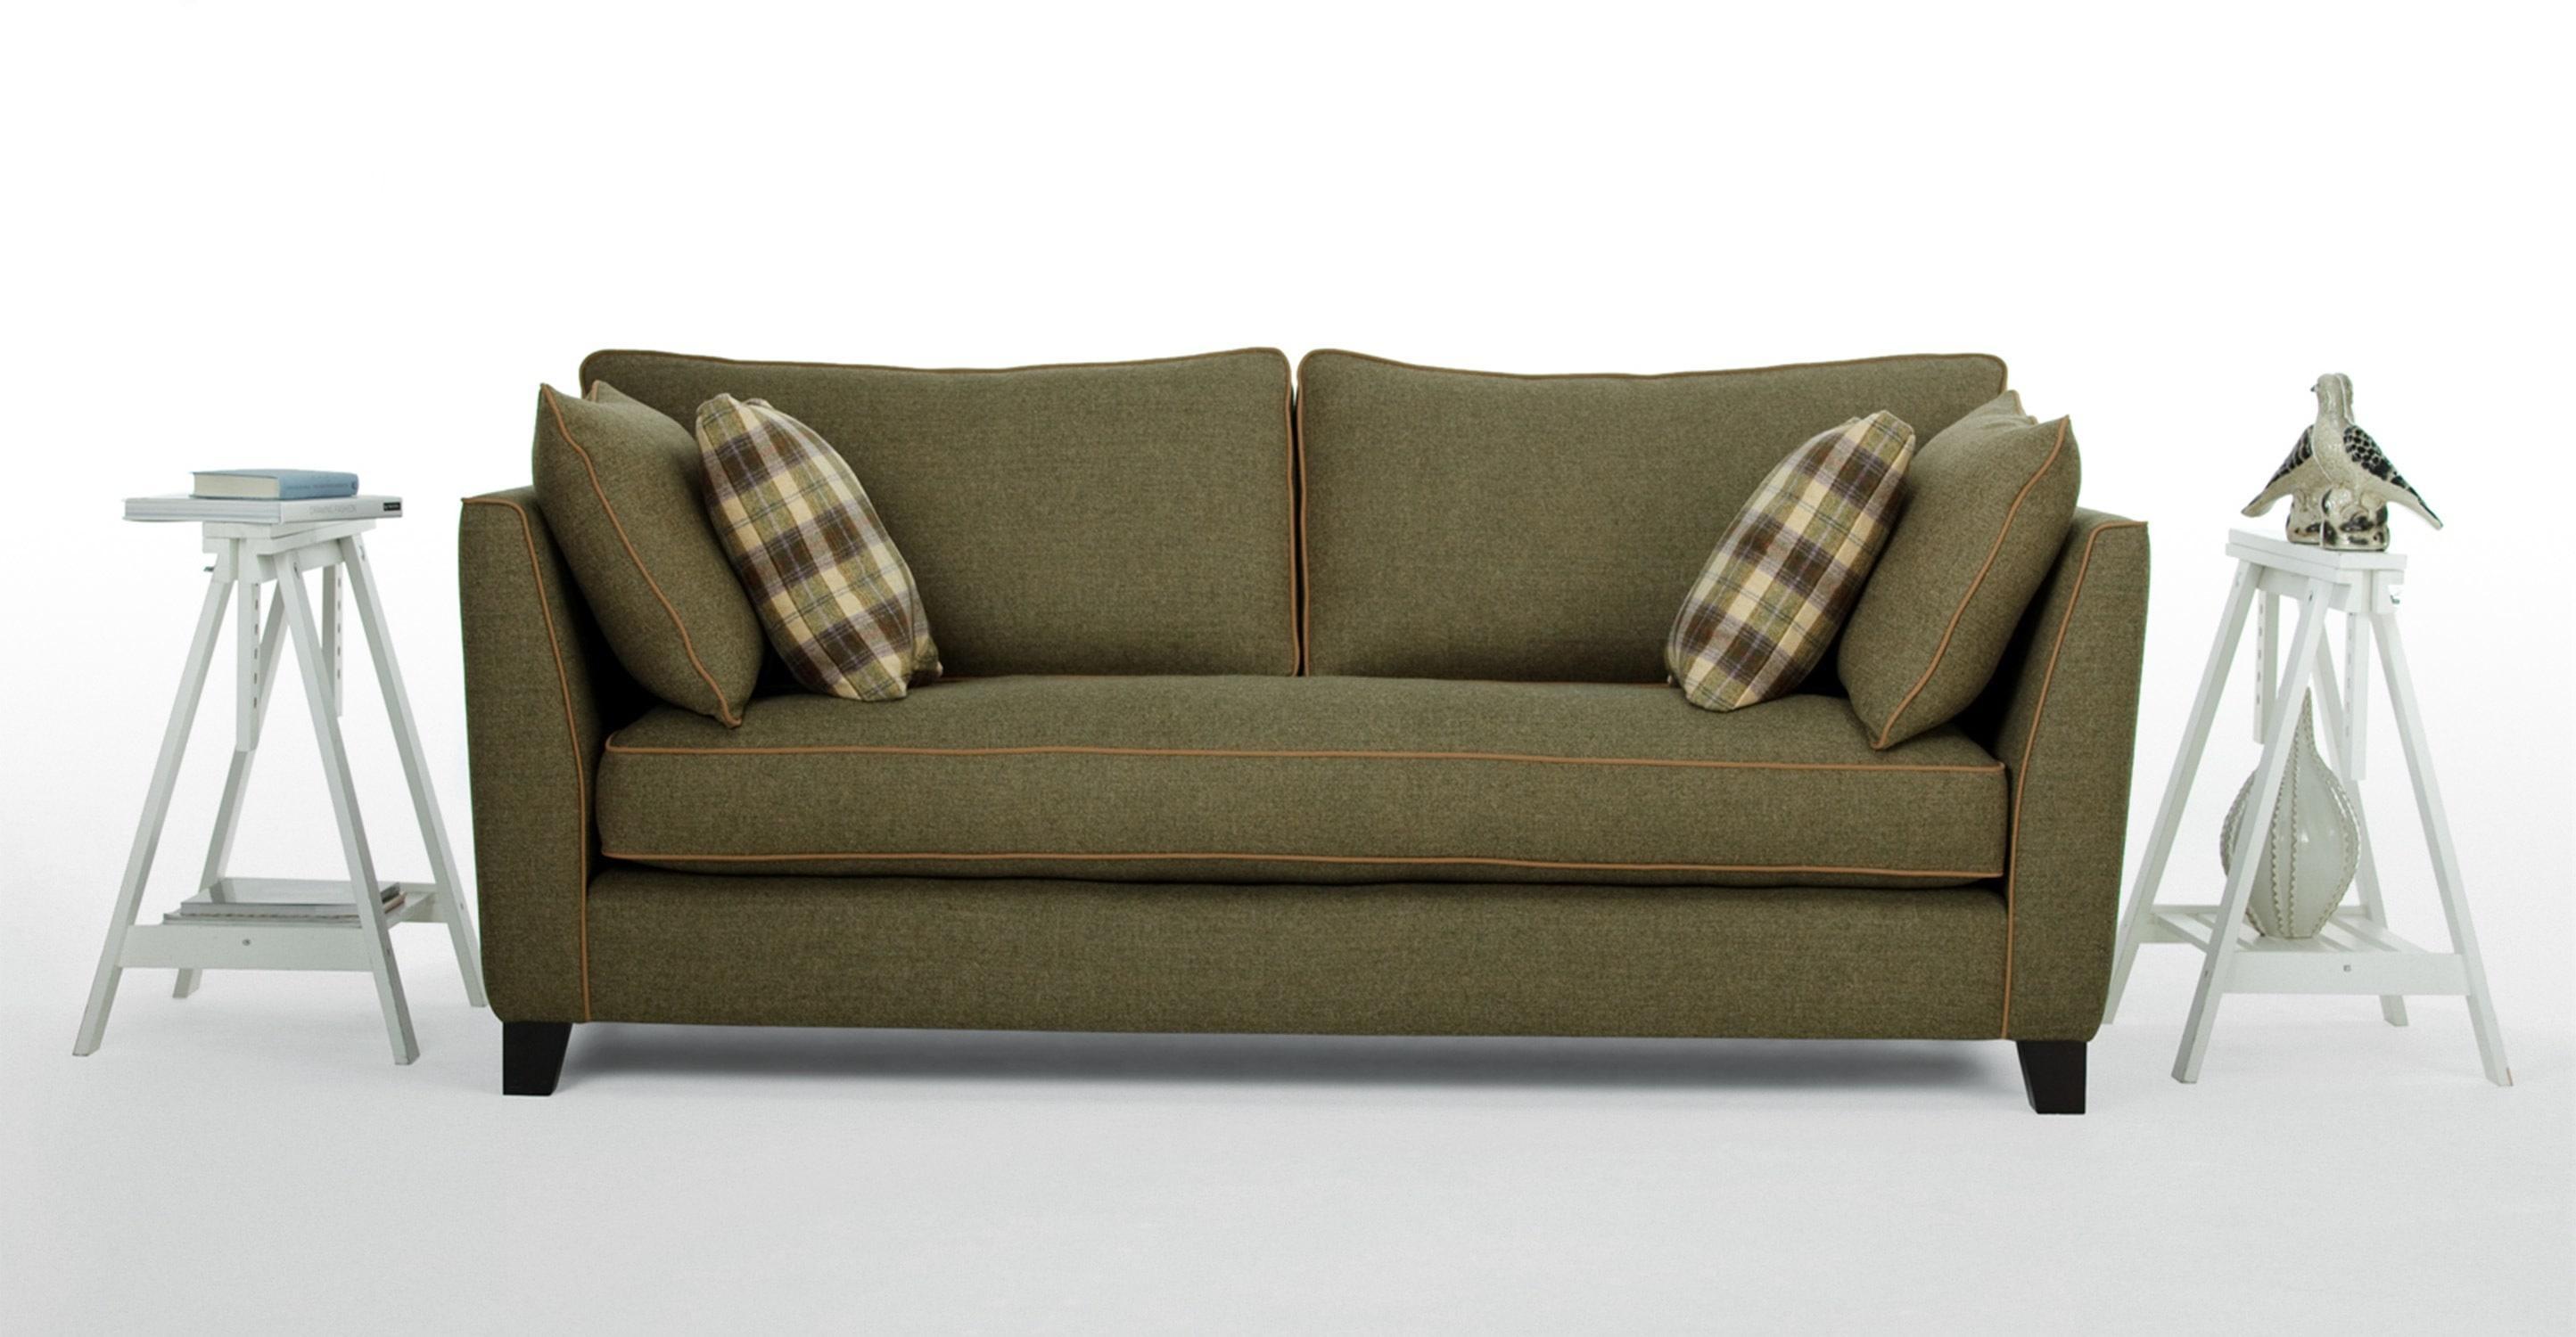 Wolseley 3 Seater Sofa In Wool Tweed | Made Throughout Tweed Fabric Sofas (Image 18 of 20)